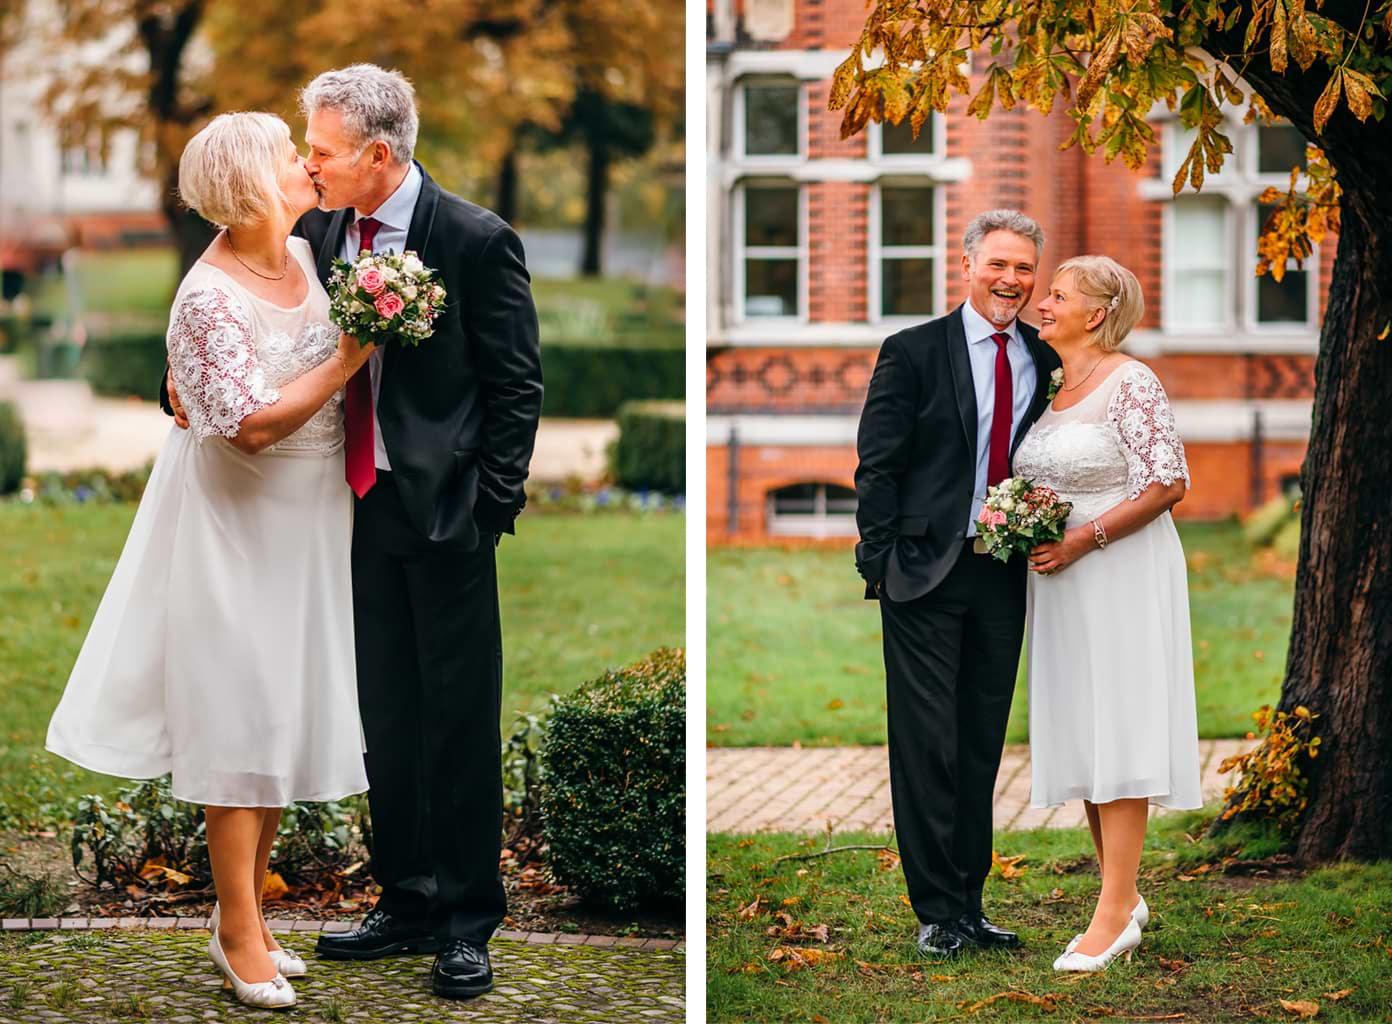 Brautpaarshooting am Standesamt Neukölln